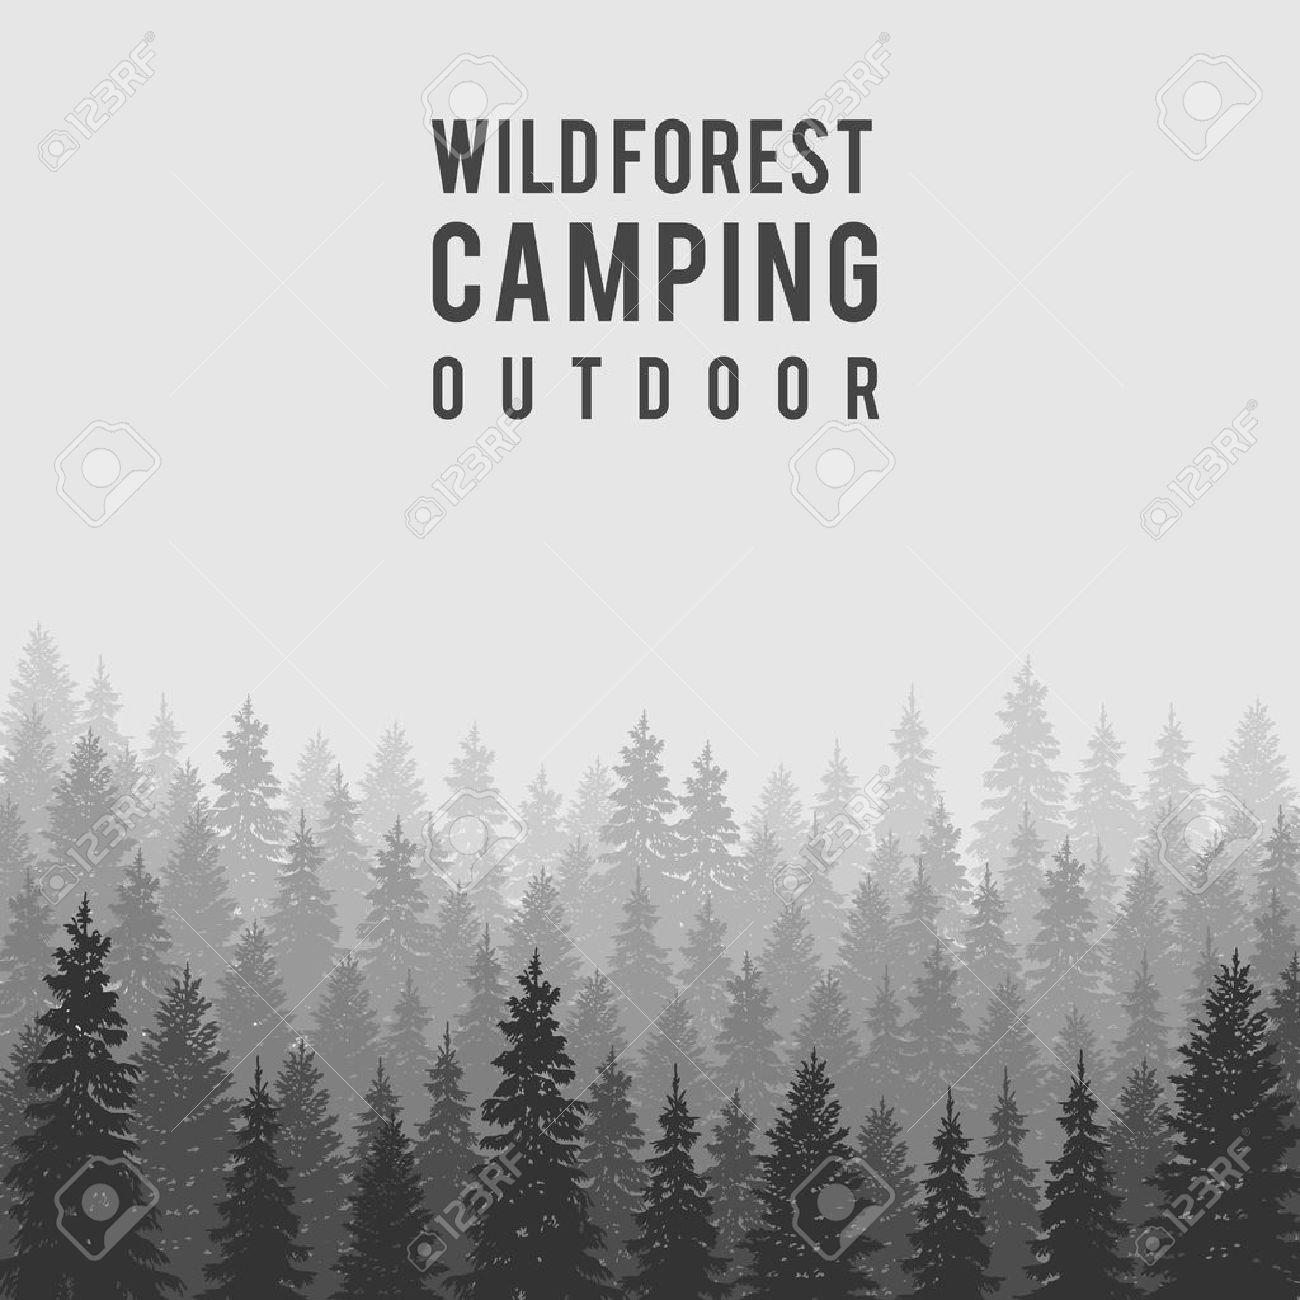 Wild Coniferous Forest Background Pine Tree Landscape Nature Wood Natural Panorama Outdoor Camping Design Template Vector Illustration Kliparty Vektory I Nabor Illyustracij Bez Oplaty Otchislenij Image 48509666